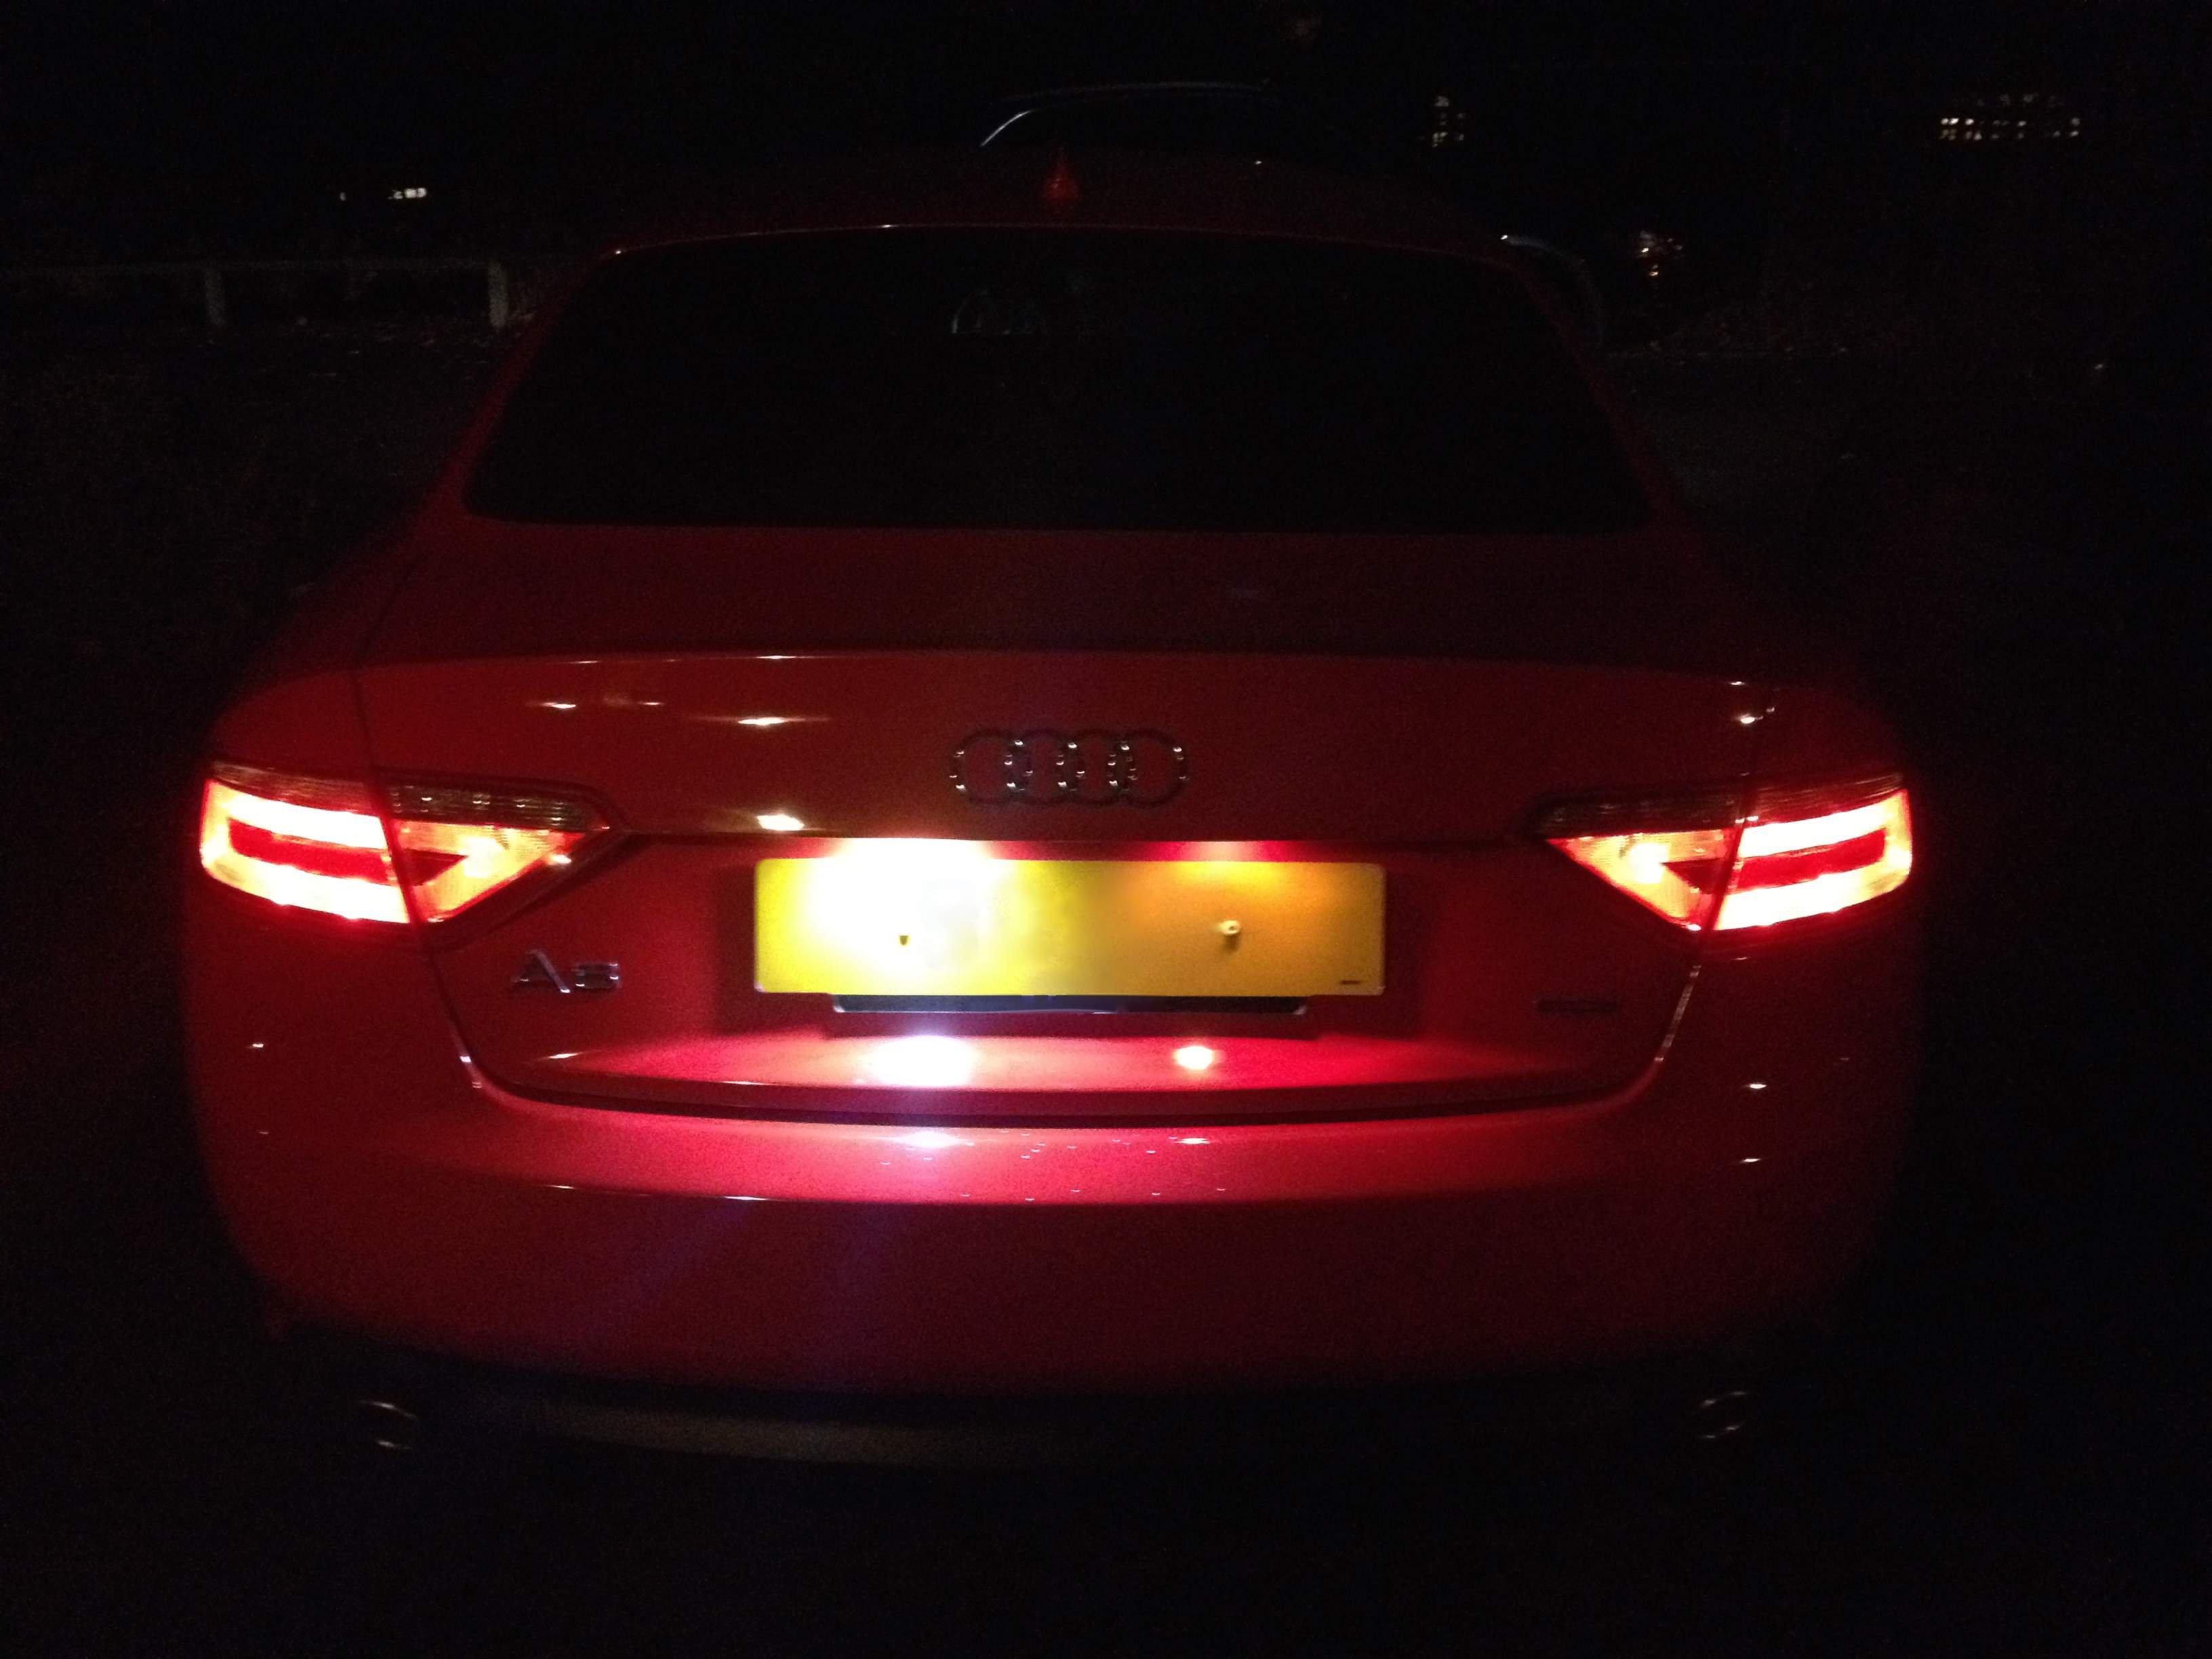 Audi A4 S4 B8 TDI TSFI License Number Plate 6 LED White Light Bulbs Upgrade